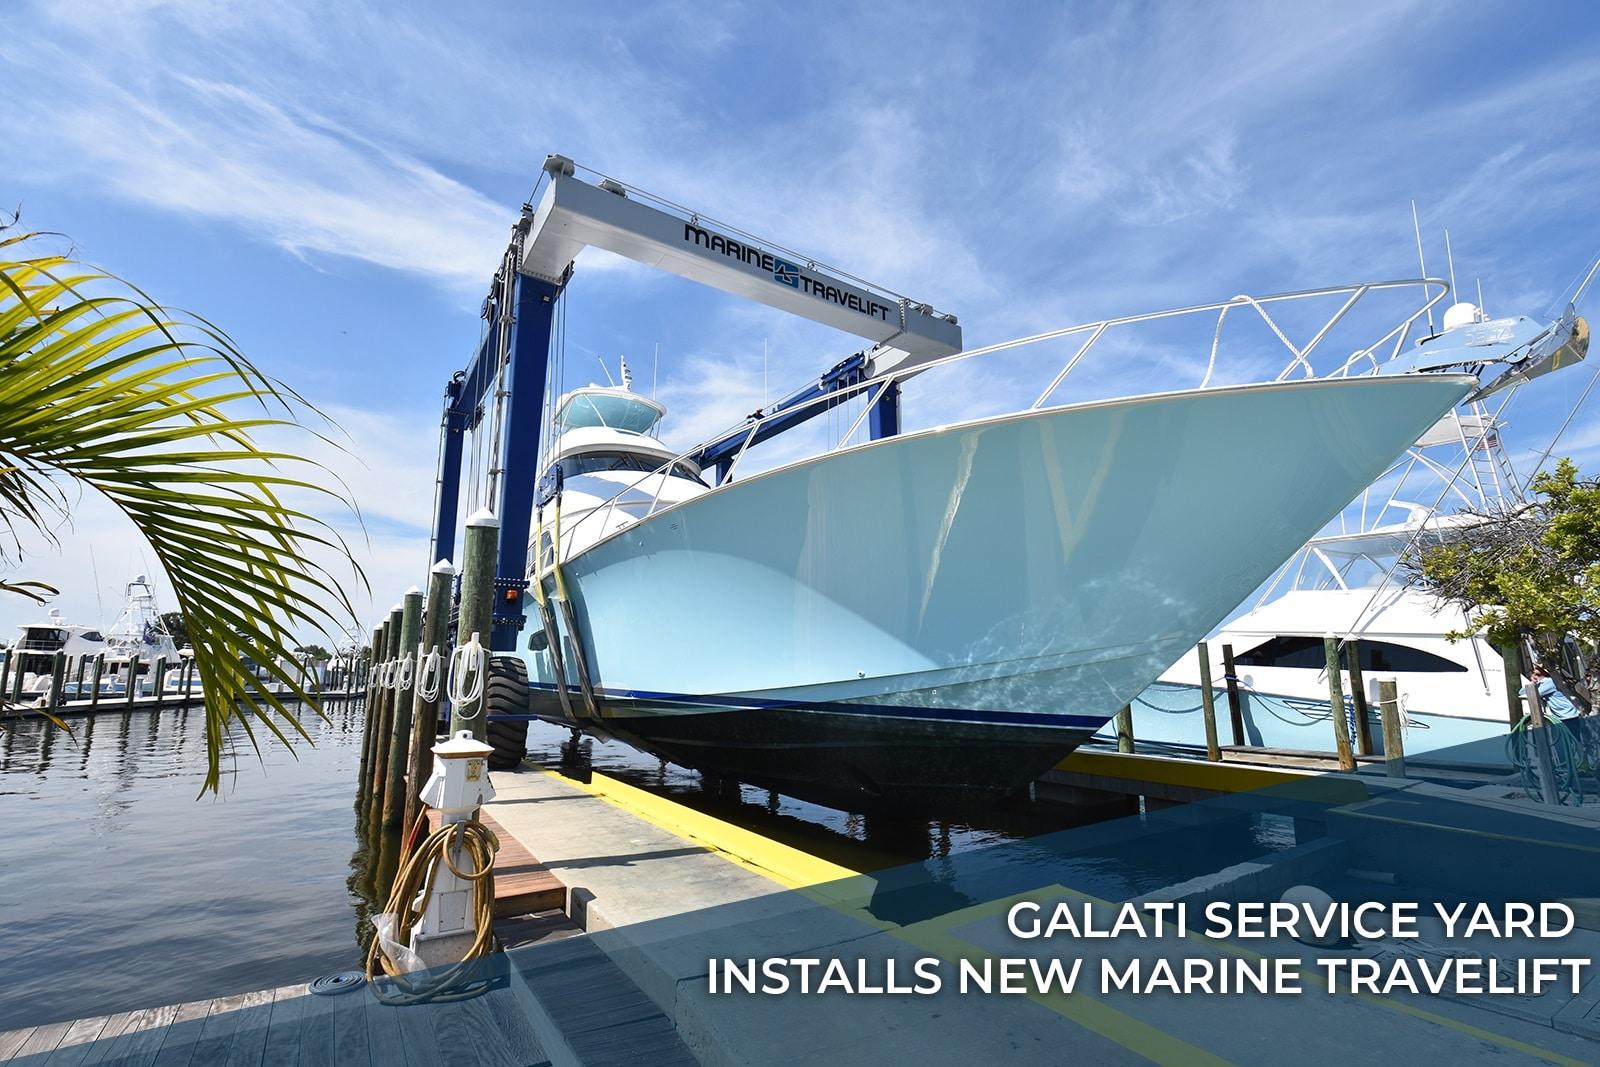 Galati Service Yard Installs New Marine Travelift